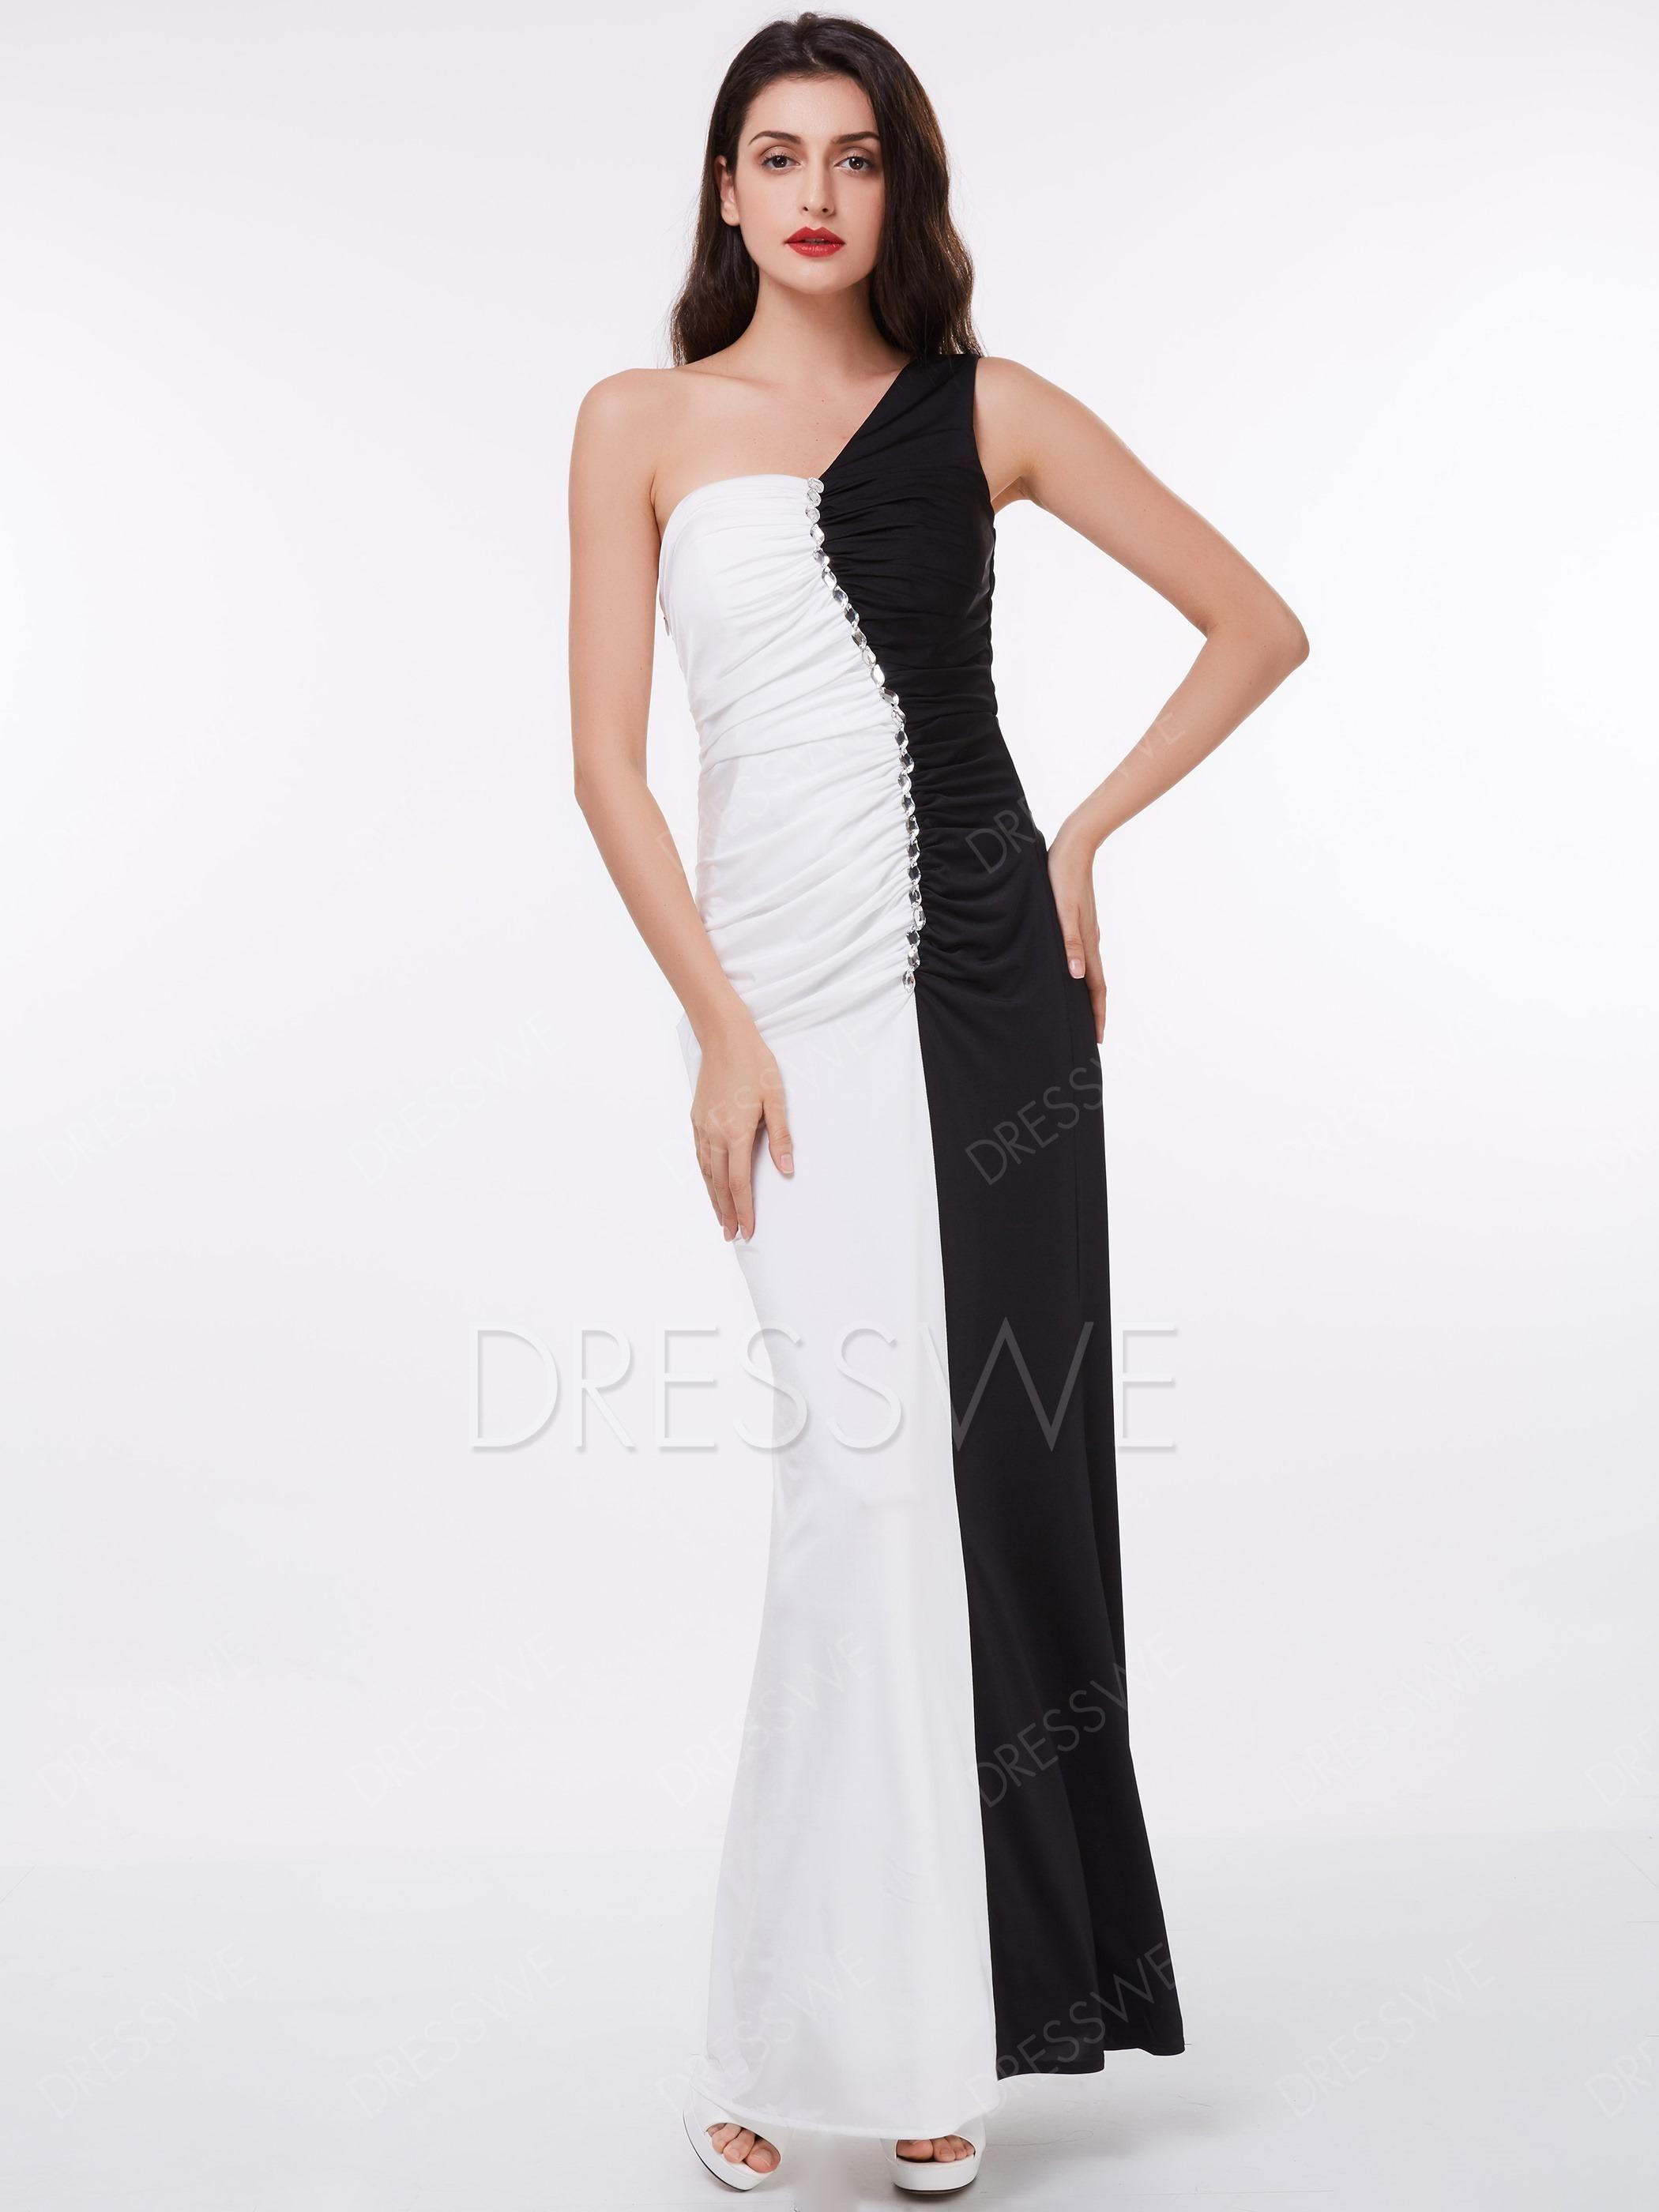 Xmas christmas dresswe dresswe classic black and white pleats